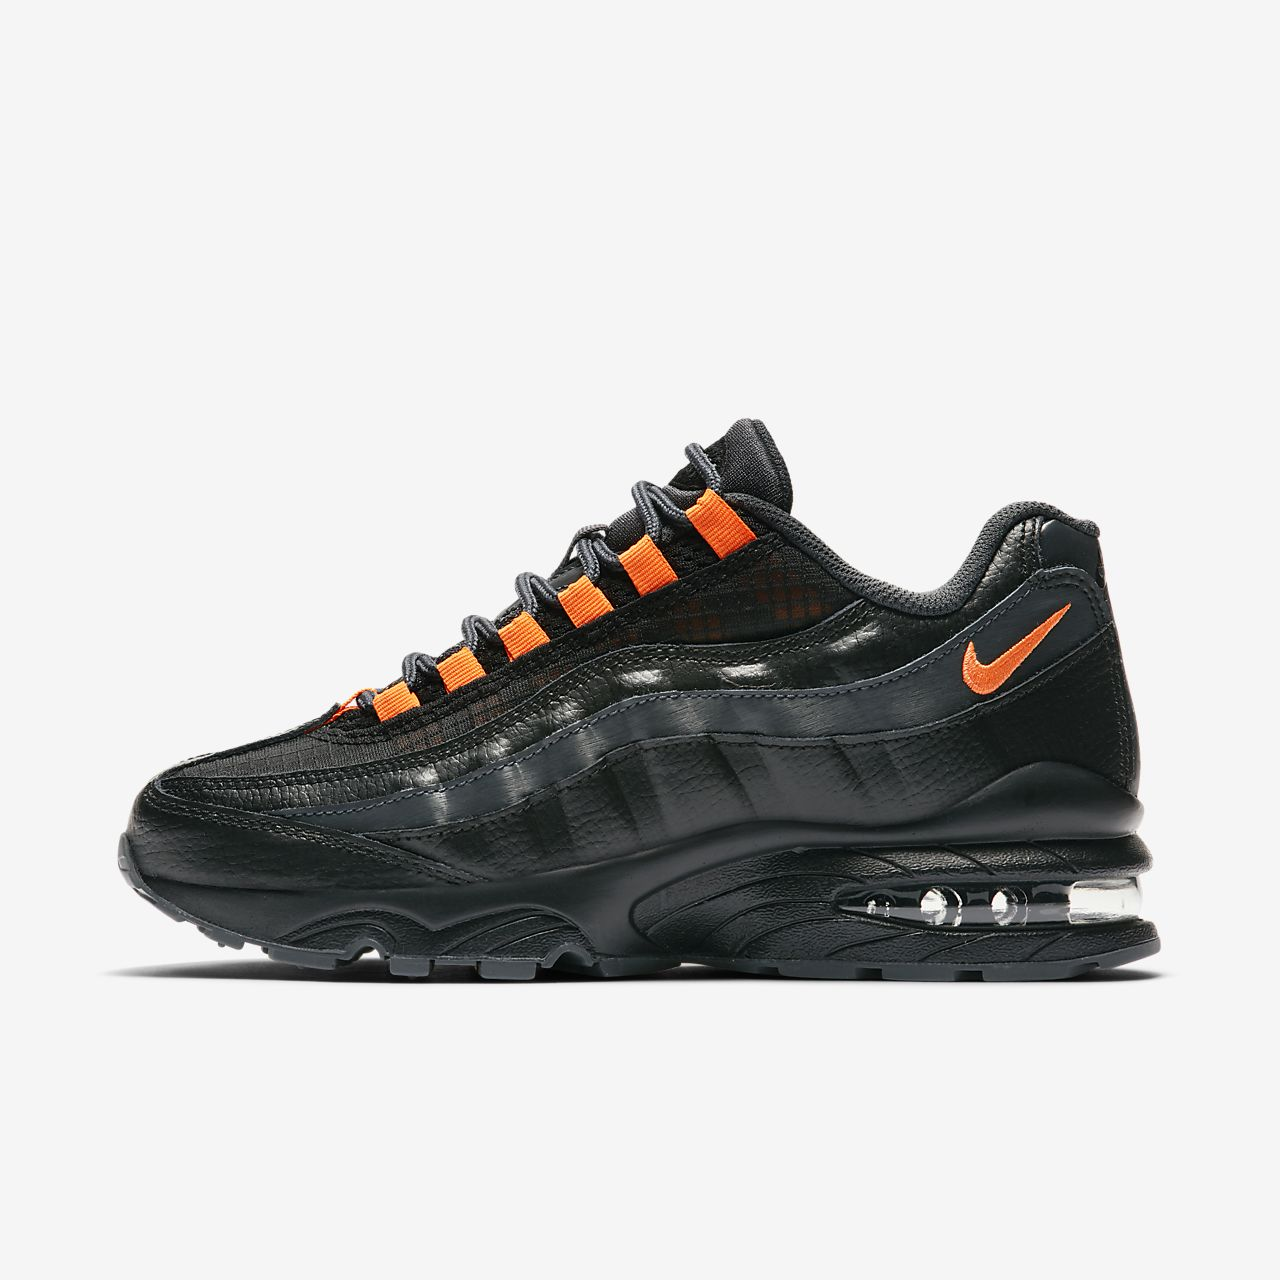 best website 79236 8622c Nike Air Max 95 SE Zapatillas - Niño a